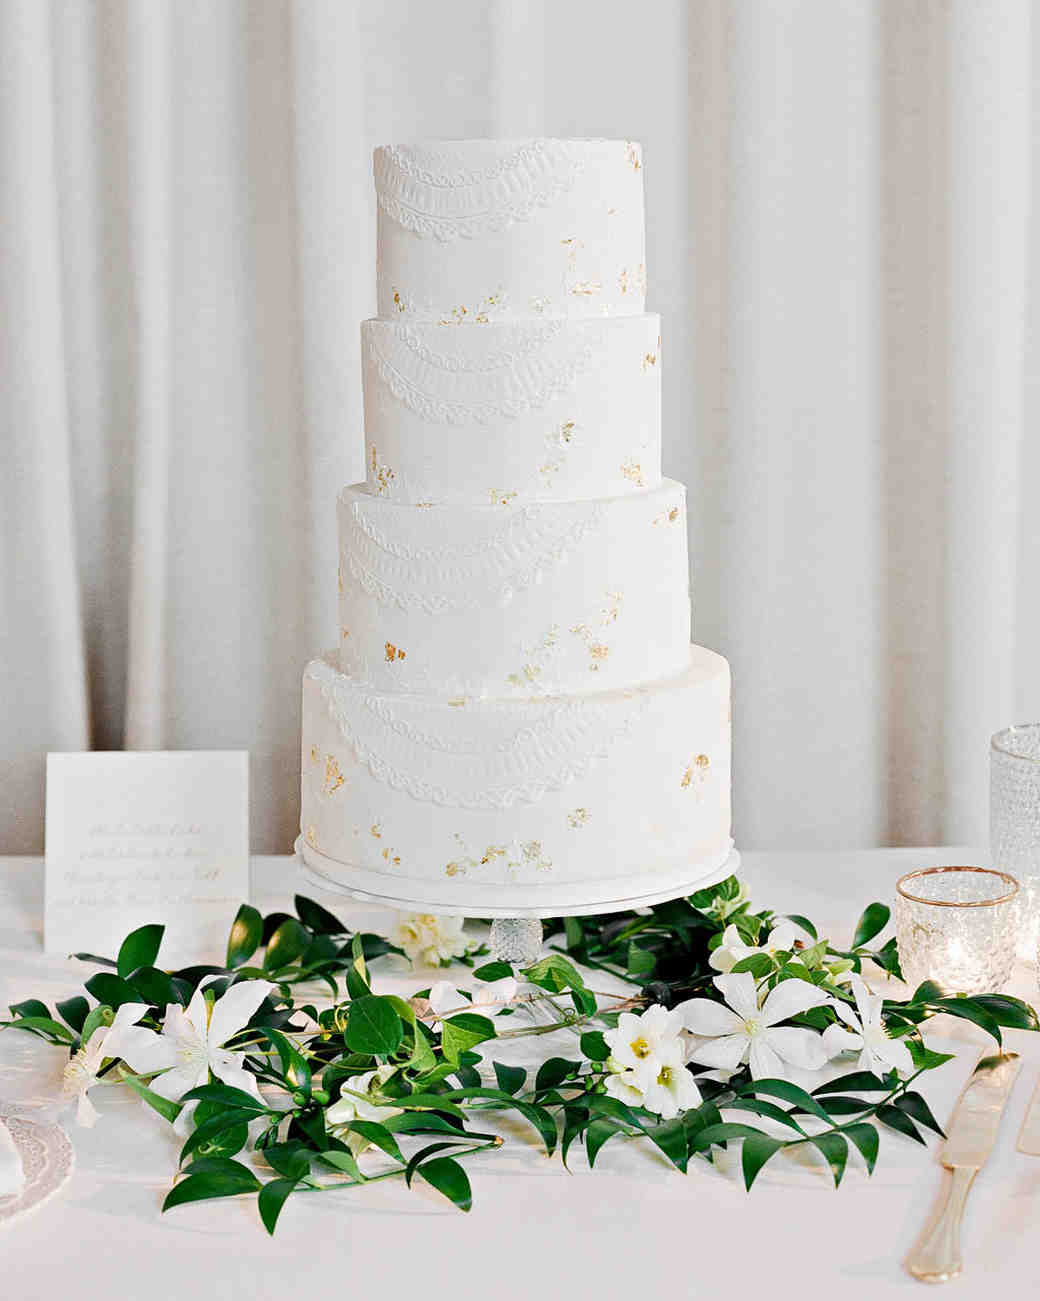 25 Timeless Yet Trendy All-White Wedding Cakes pics